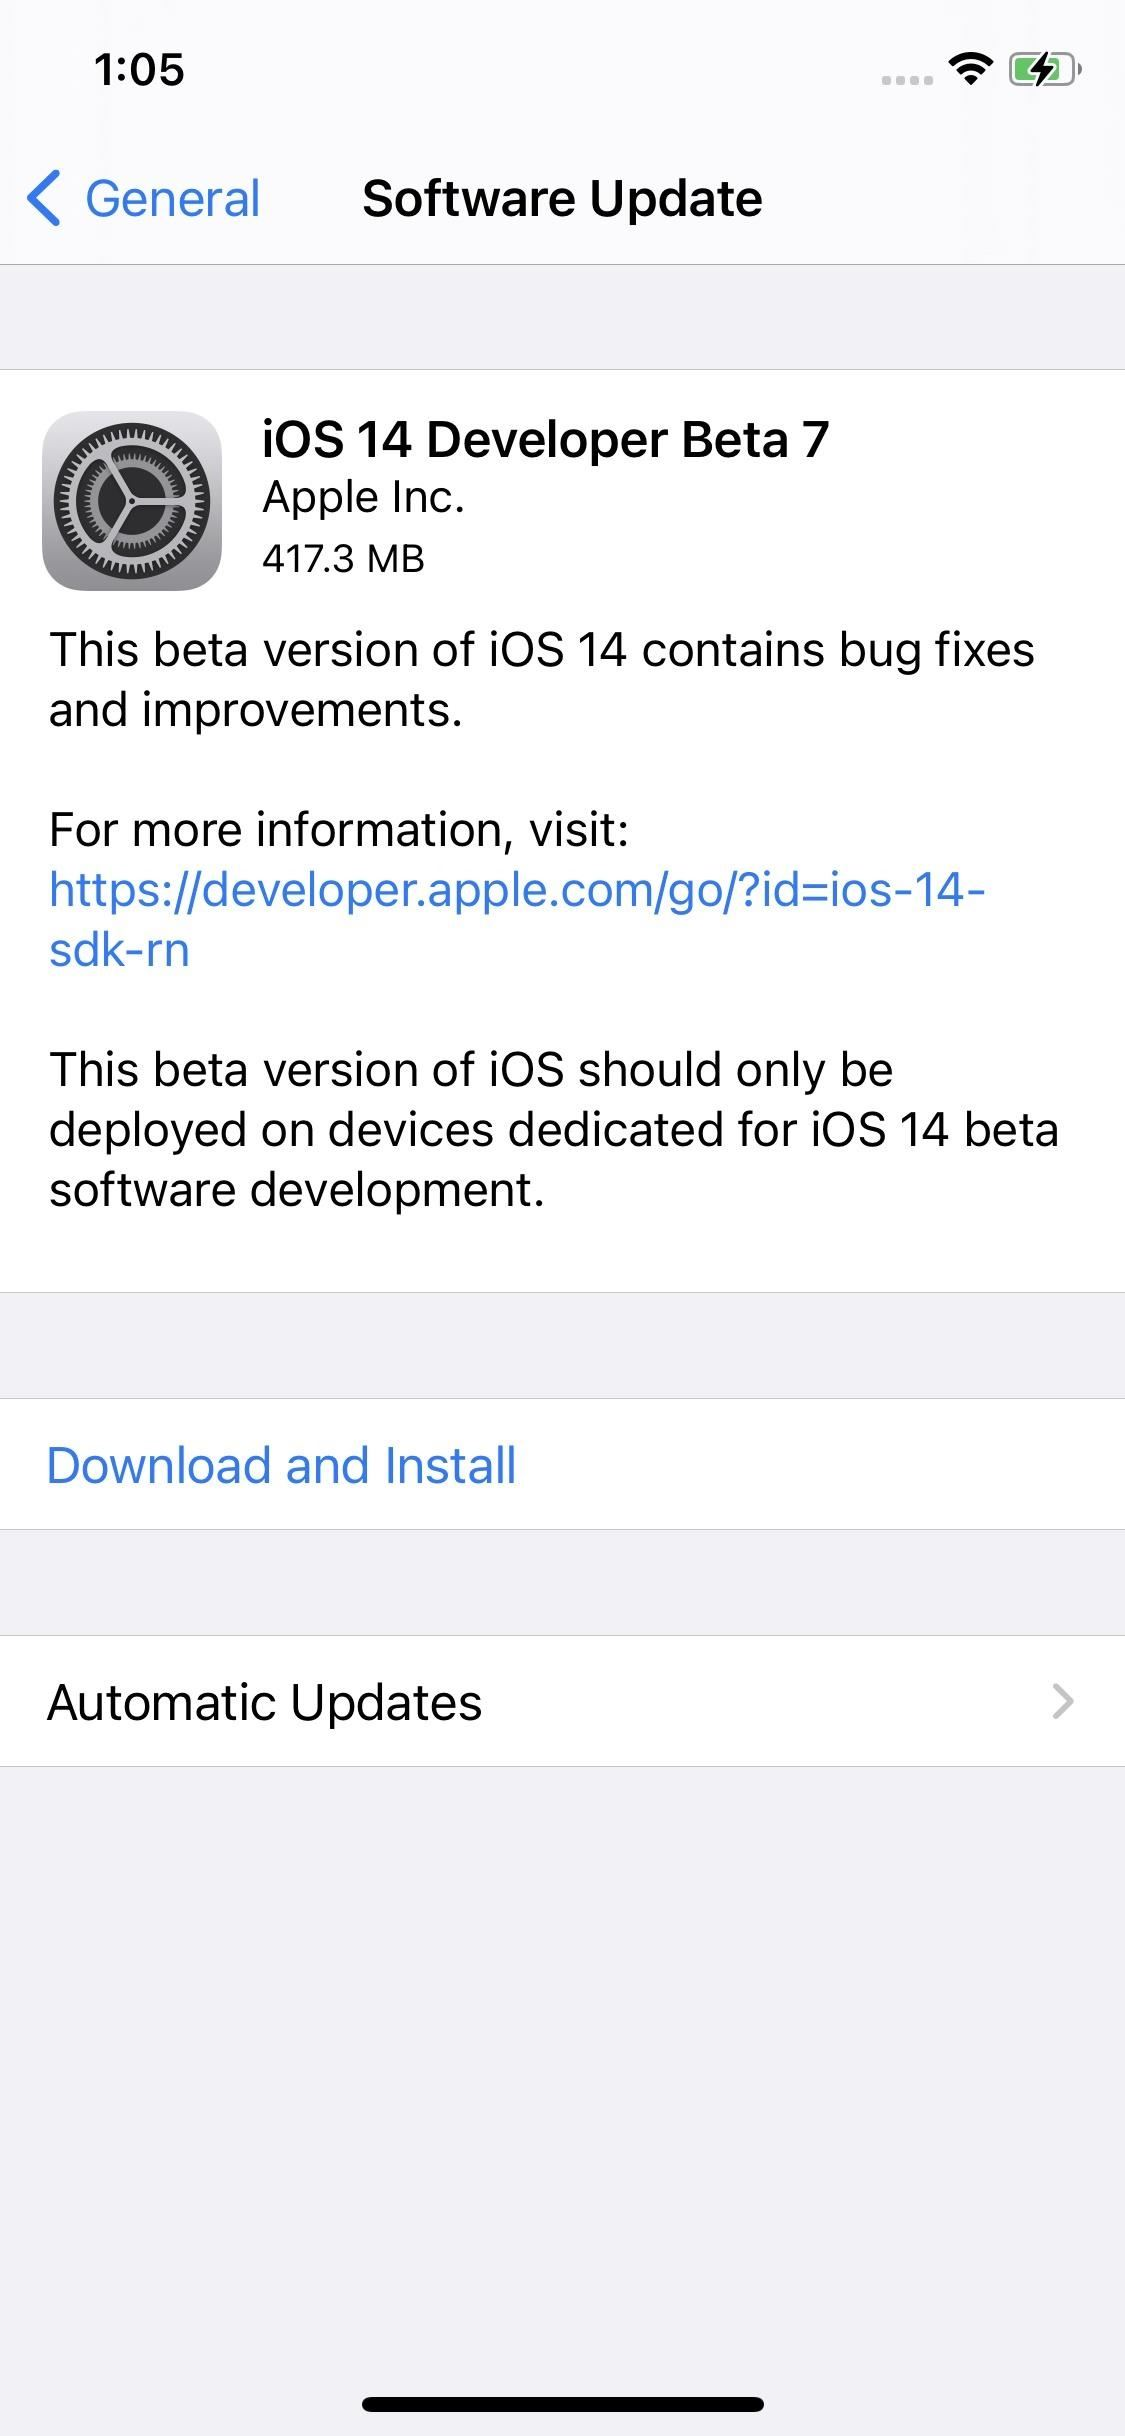 Apple Releases Ios 14 Developer Beta 7 For Iphone Includes New Wallpaper Options Ios Iphone Gadget Hacks We Bra